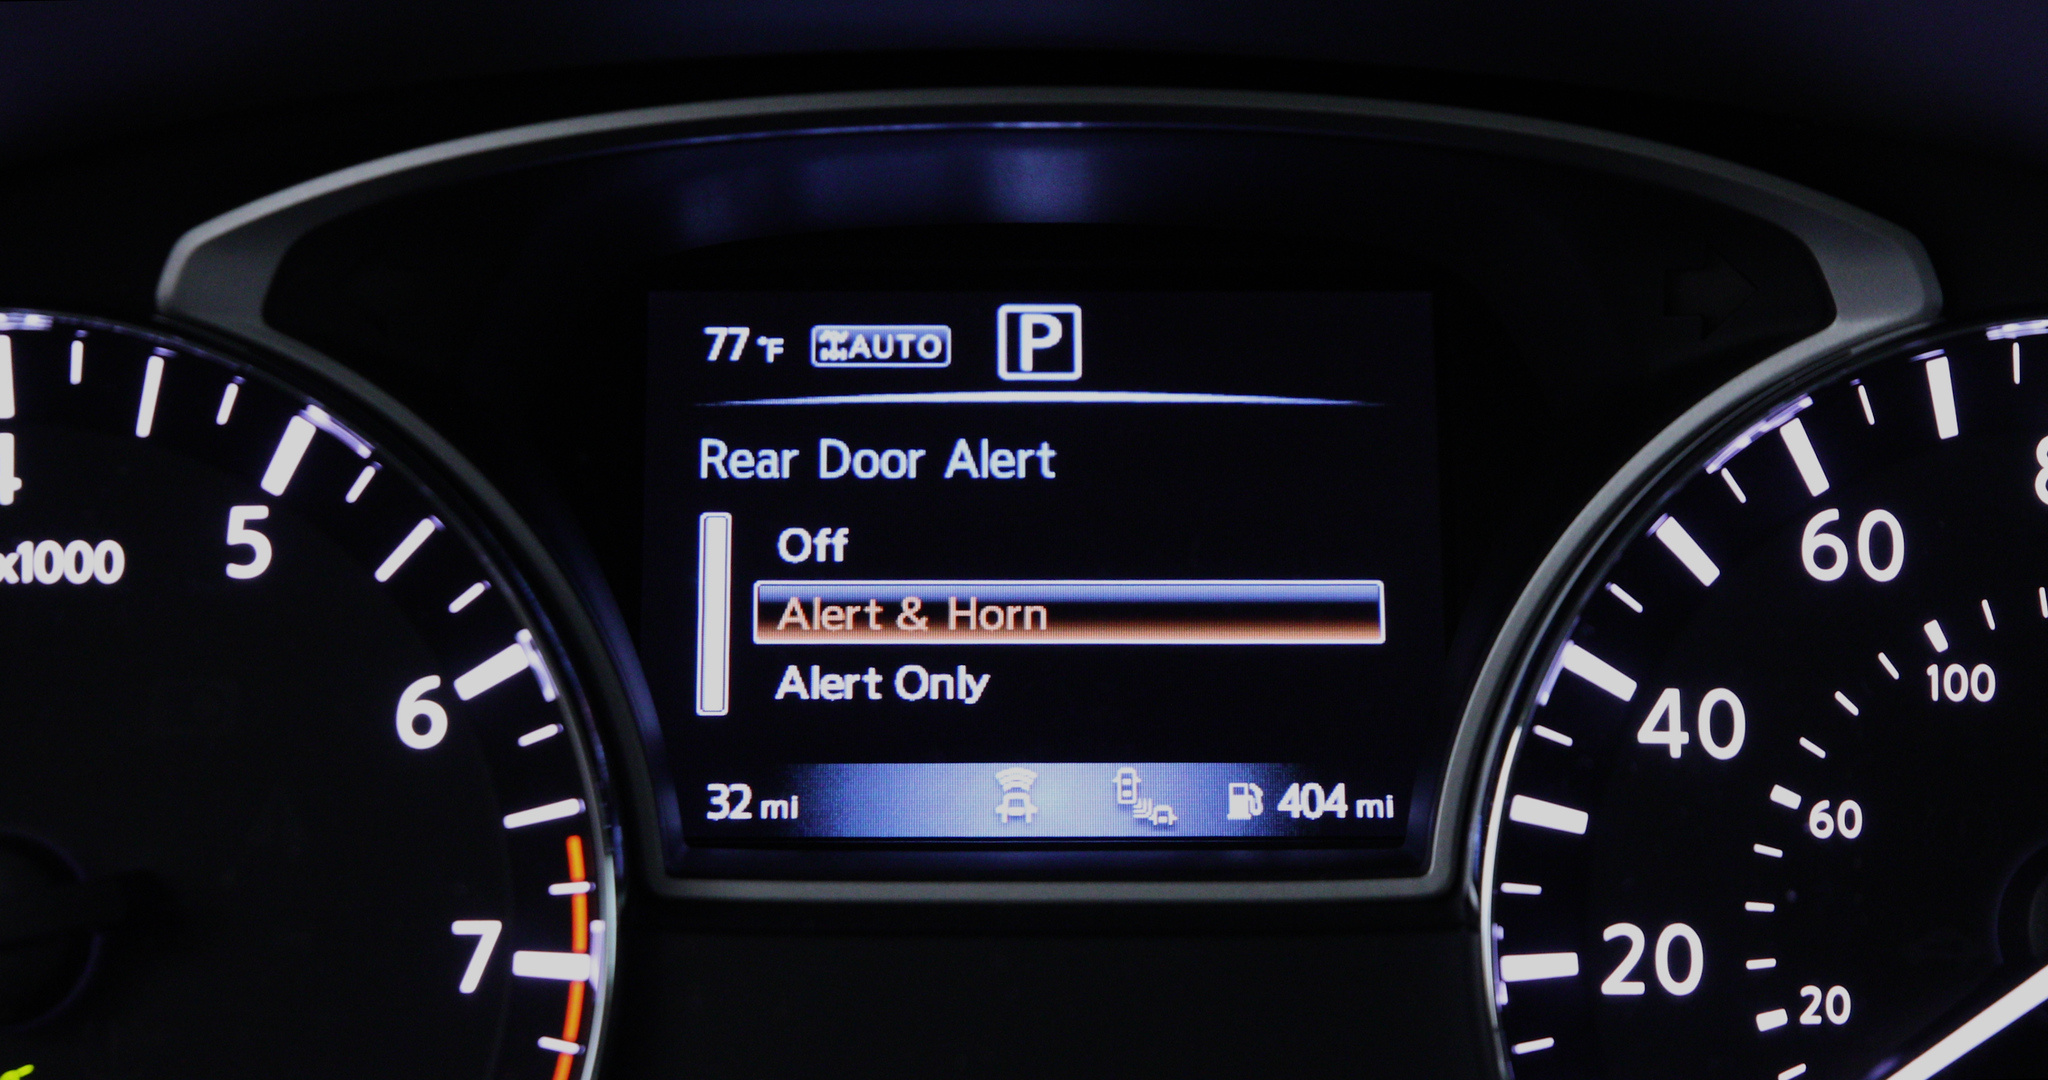 Nissan Reveals First Of A Kind Rear Door Alert RDA 2048x1080